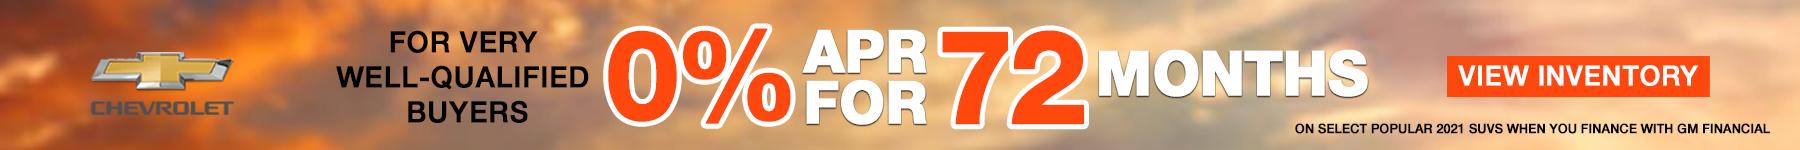 PARKS 0% APR FOR 72 MOS PENCIL